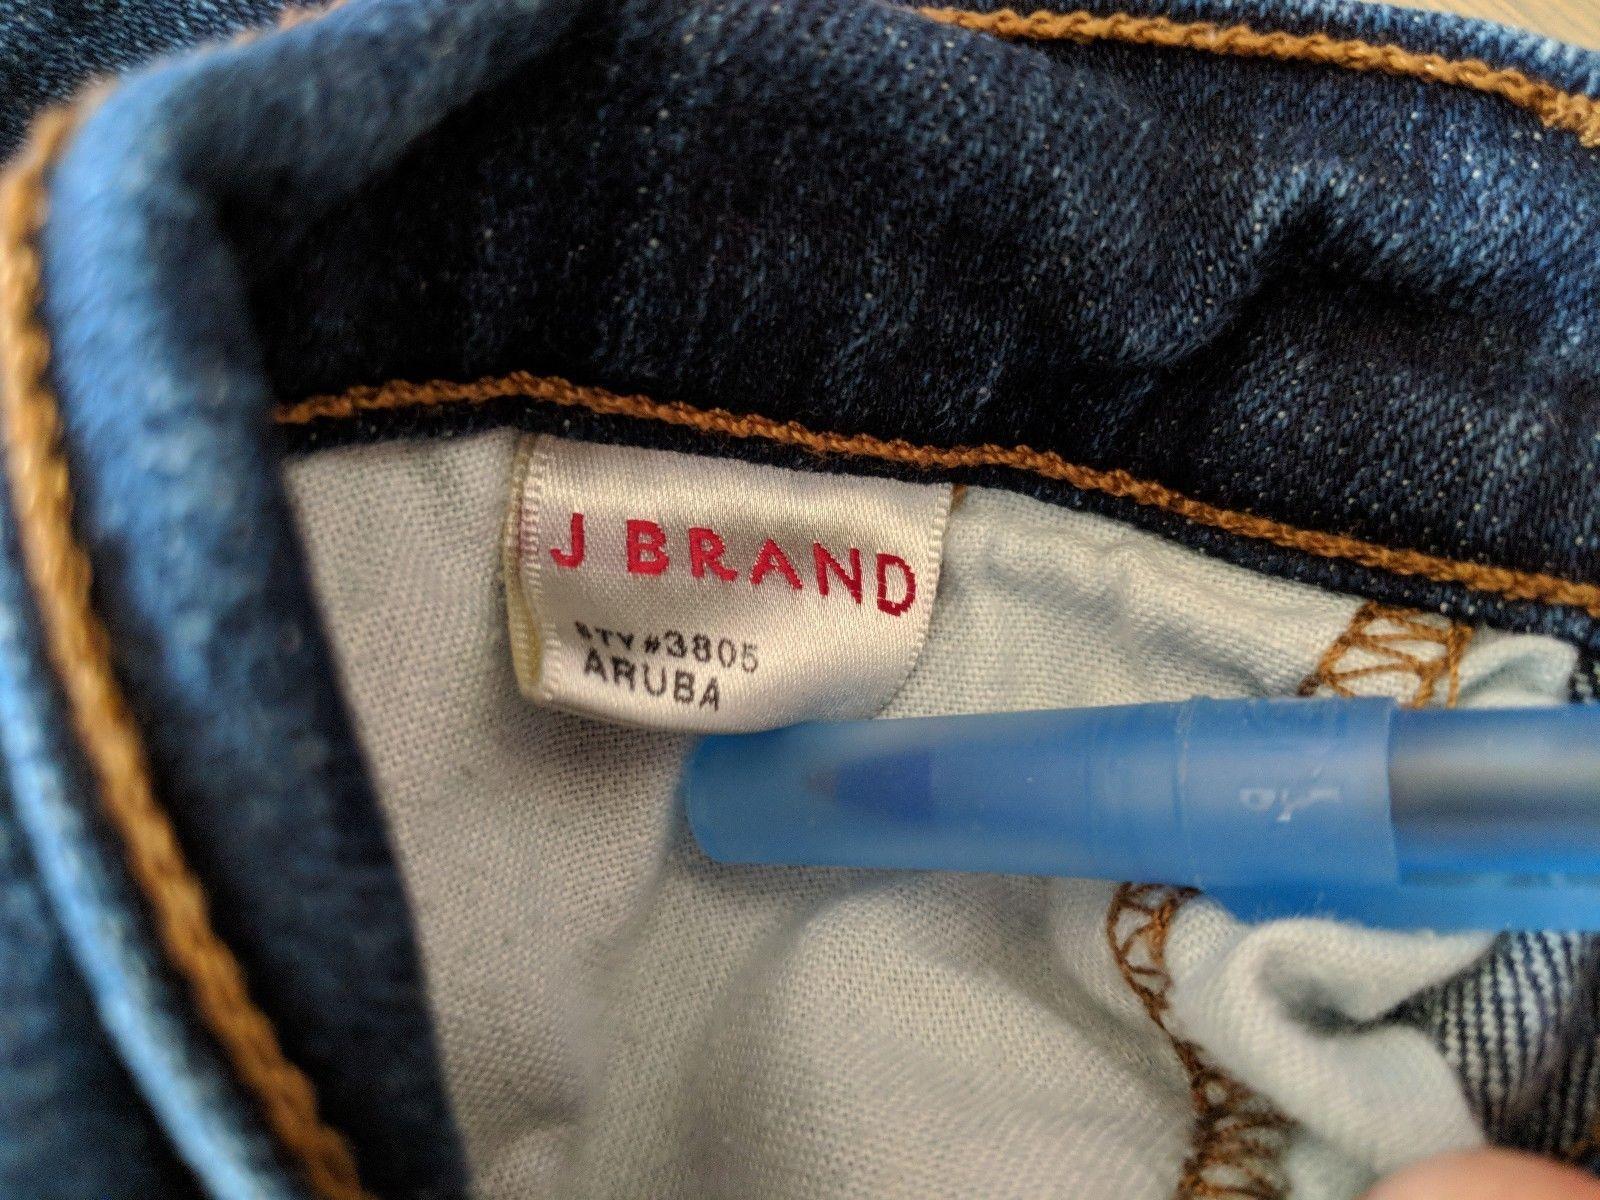 J Brand 28 Aruba Denim Skinny Slim Stretch Medium Wash Jeans Womens Pants image 7